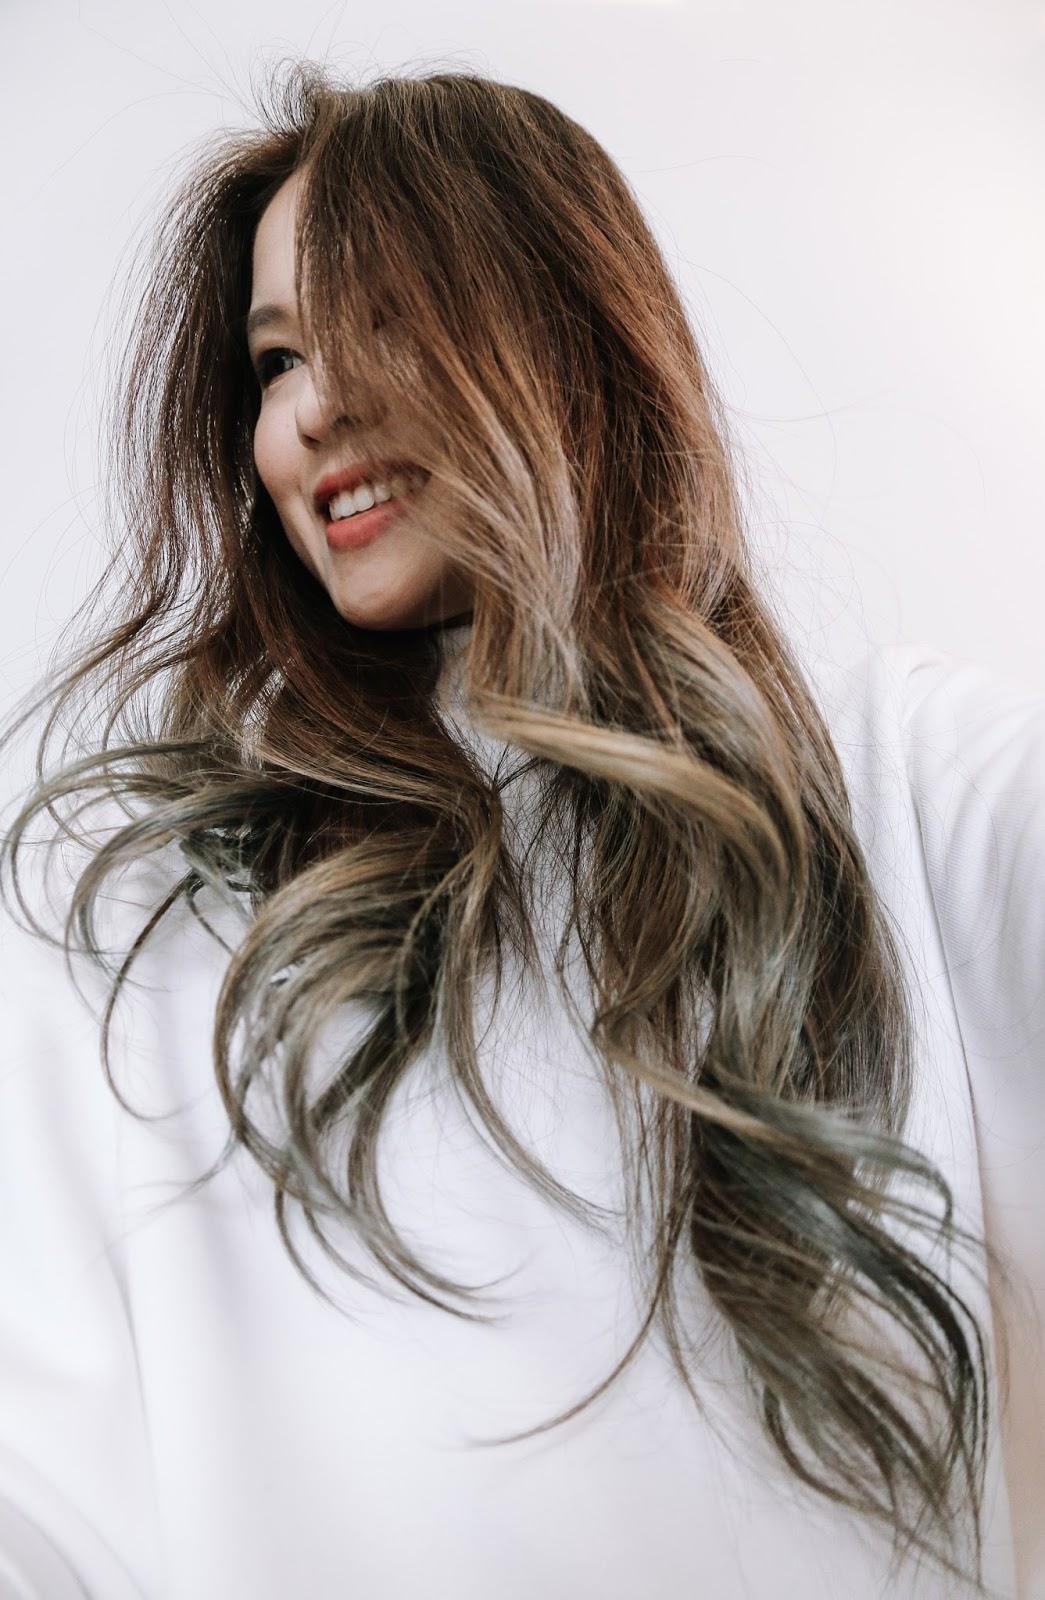 Best 25 Peekaboo Color Ideas On Pinterest Of Subtle Underneath Hair Color   dagpress.com